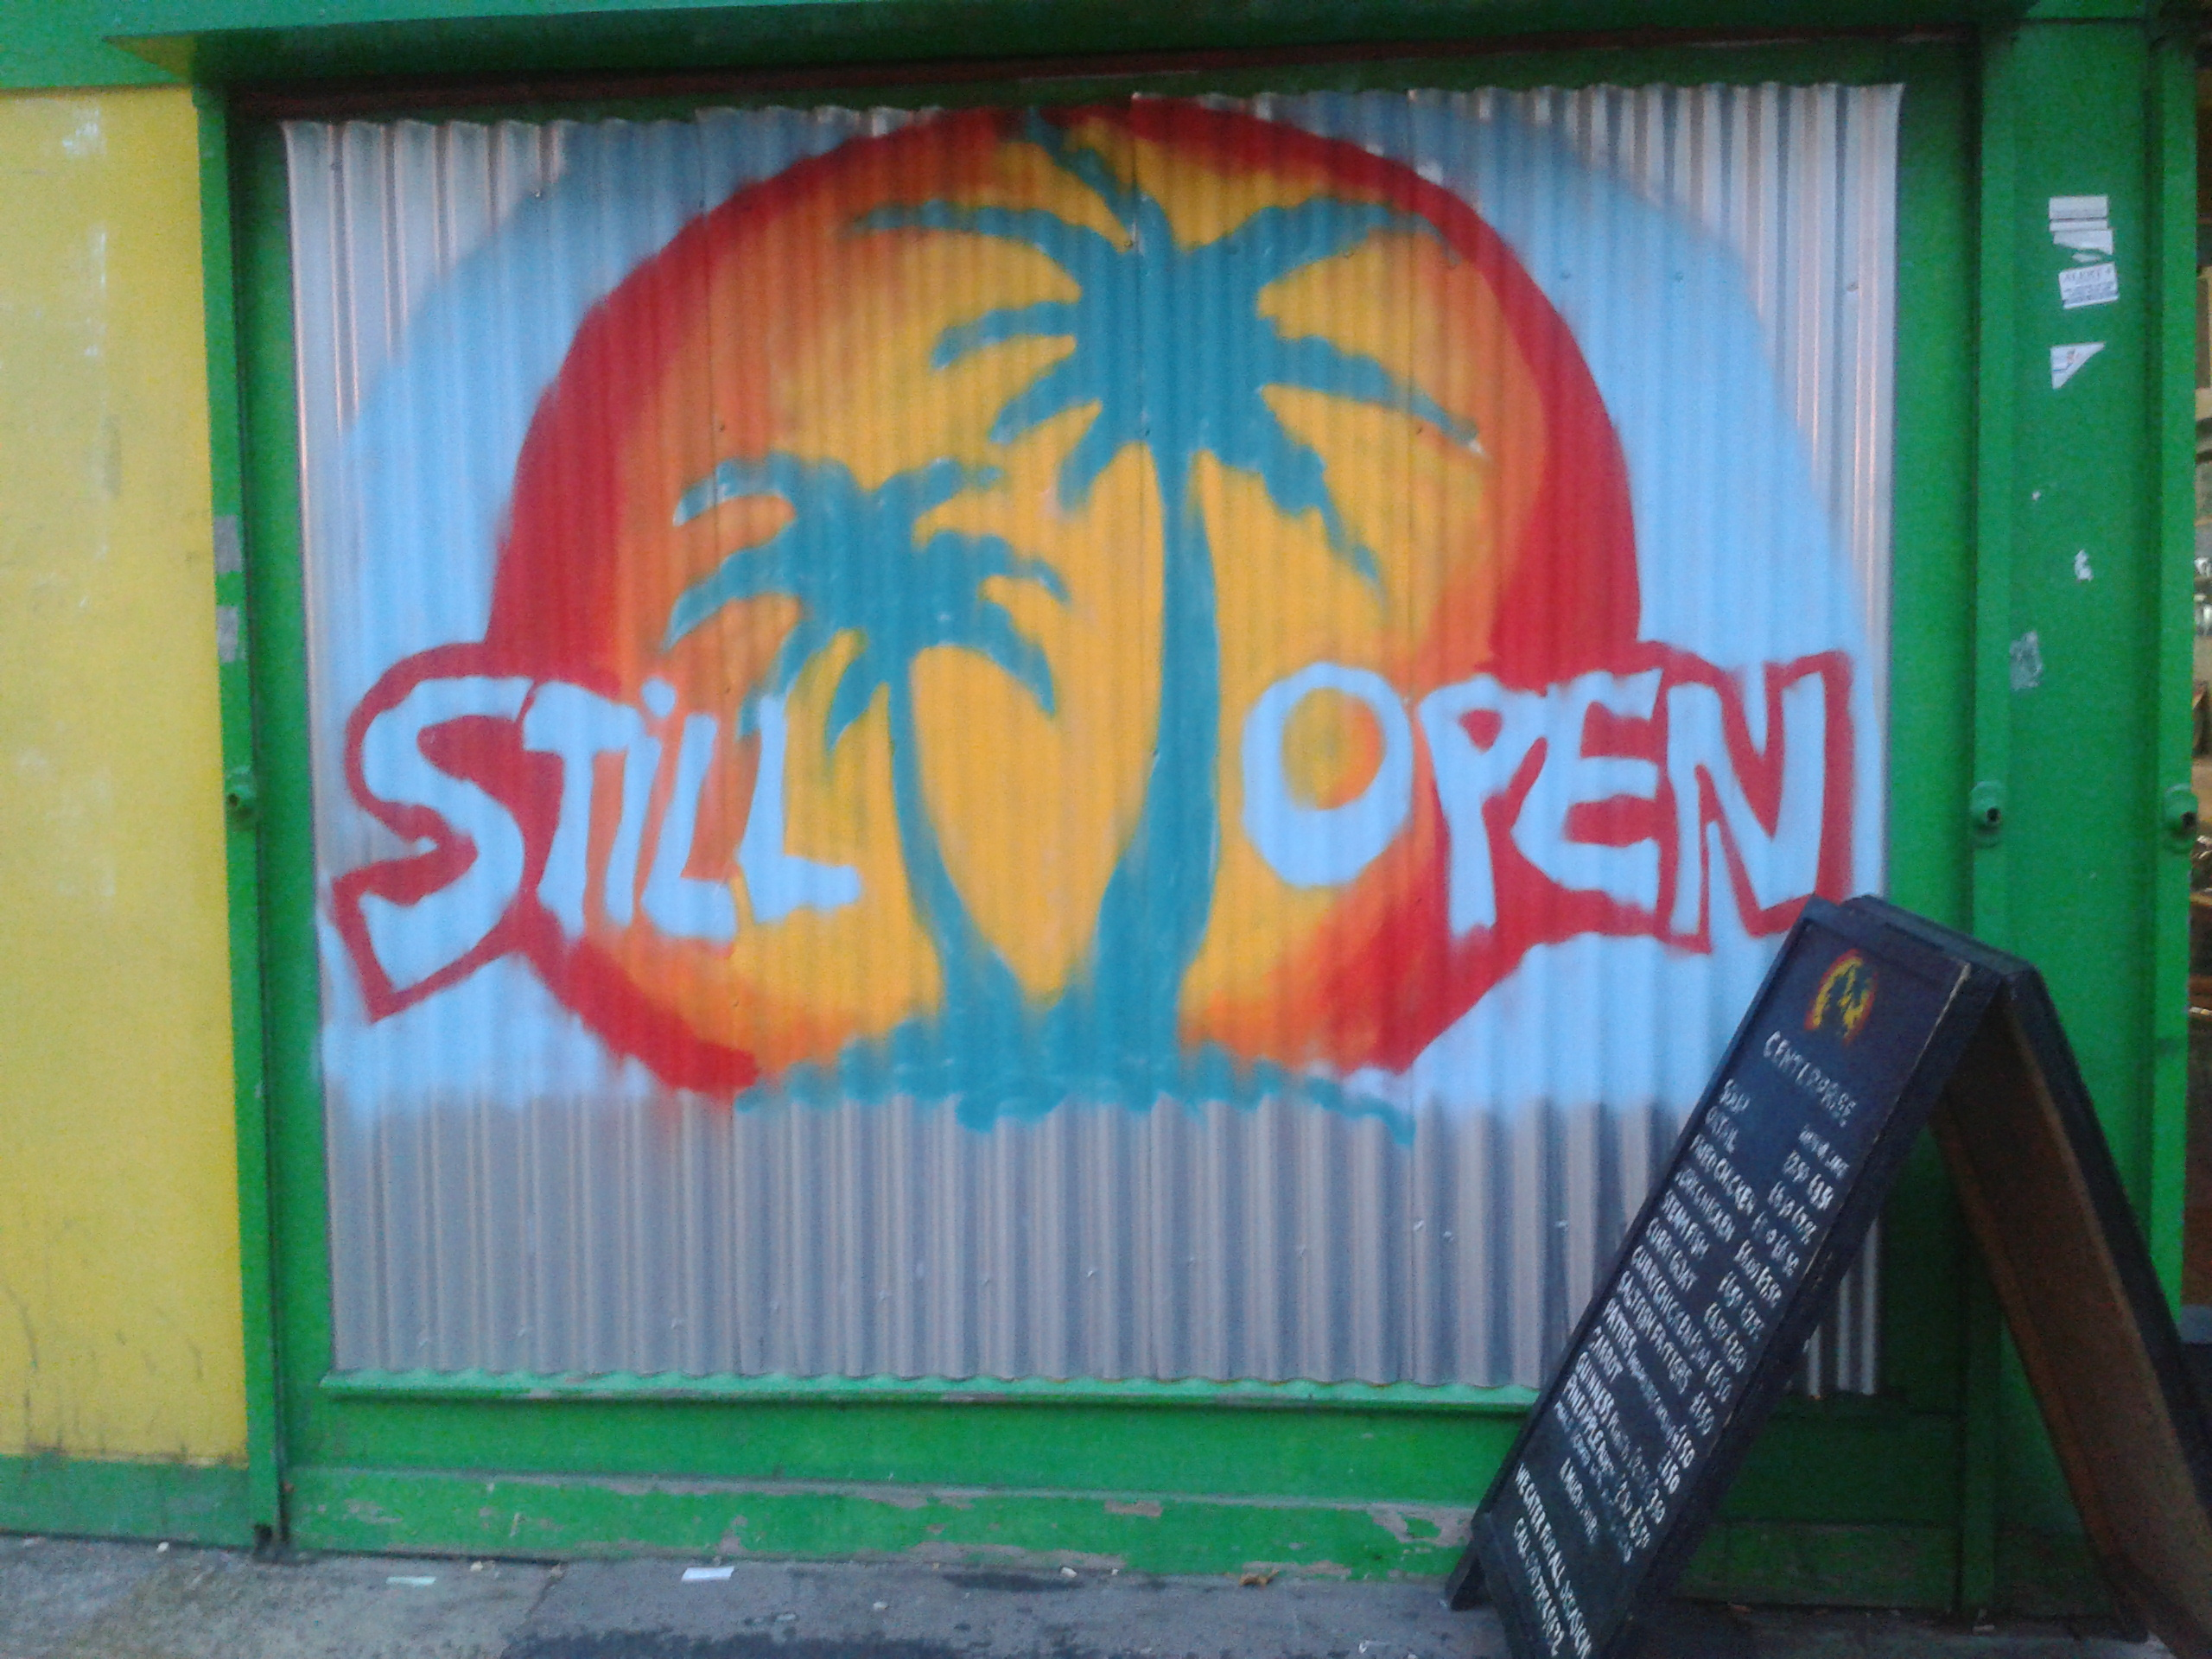 centerprise-still-open